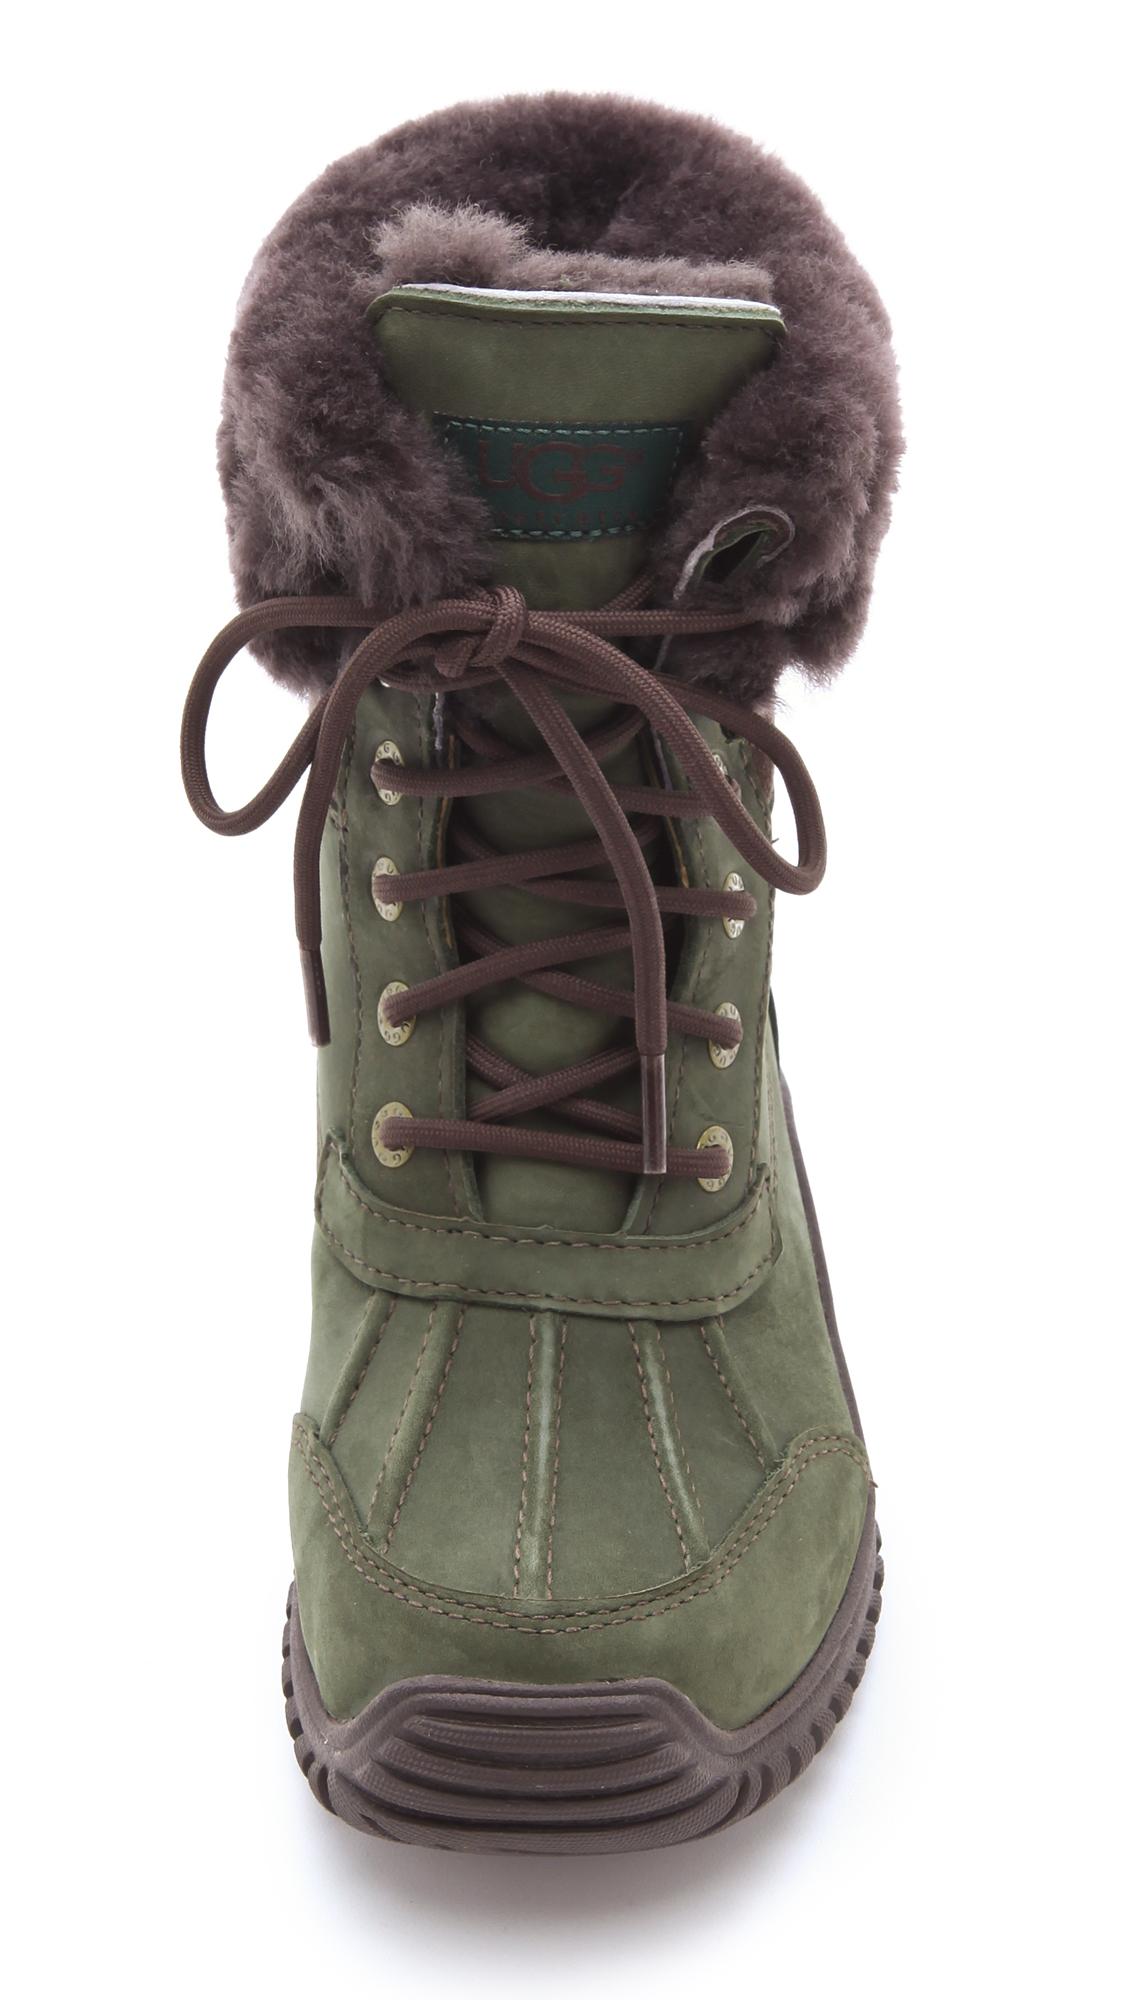 green adirondack ugg boots